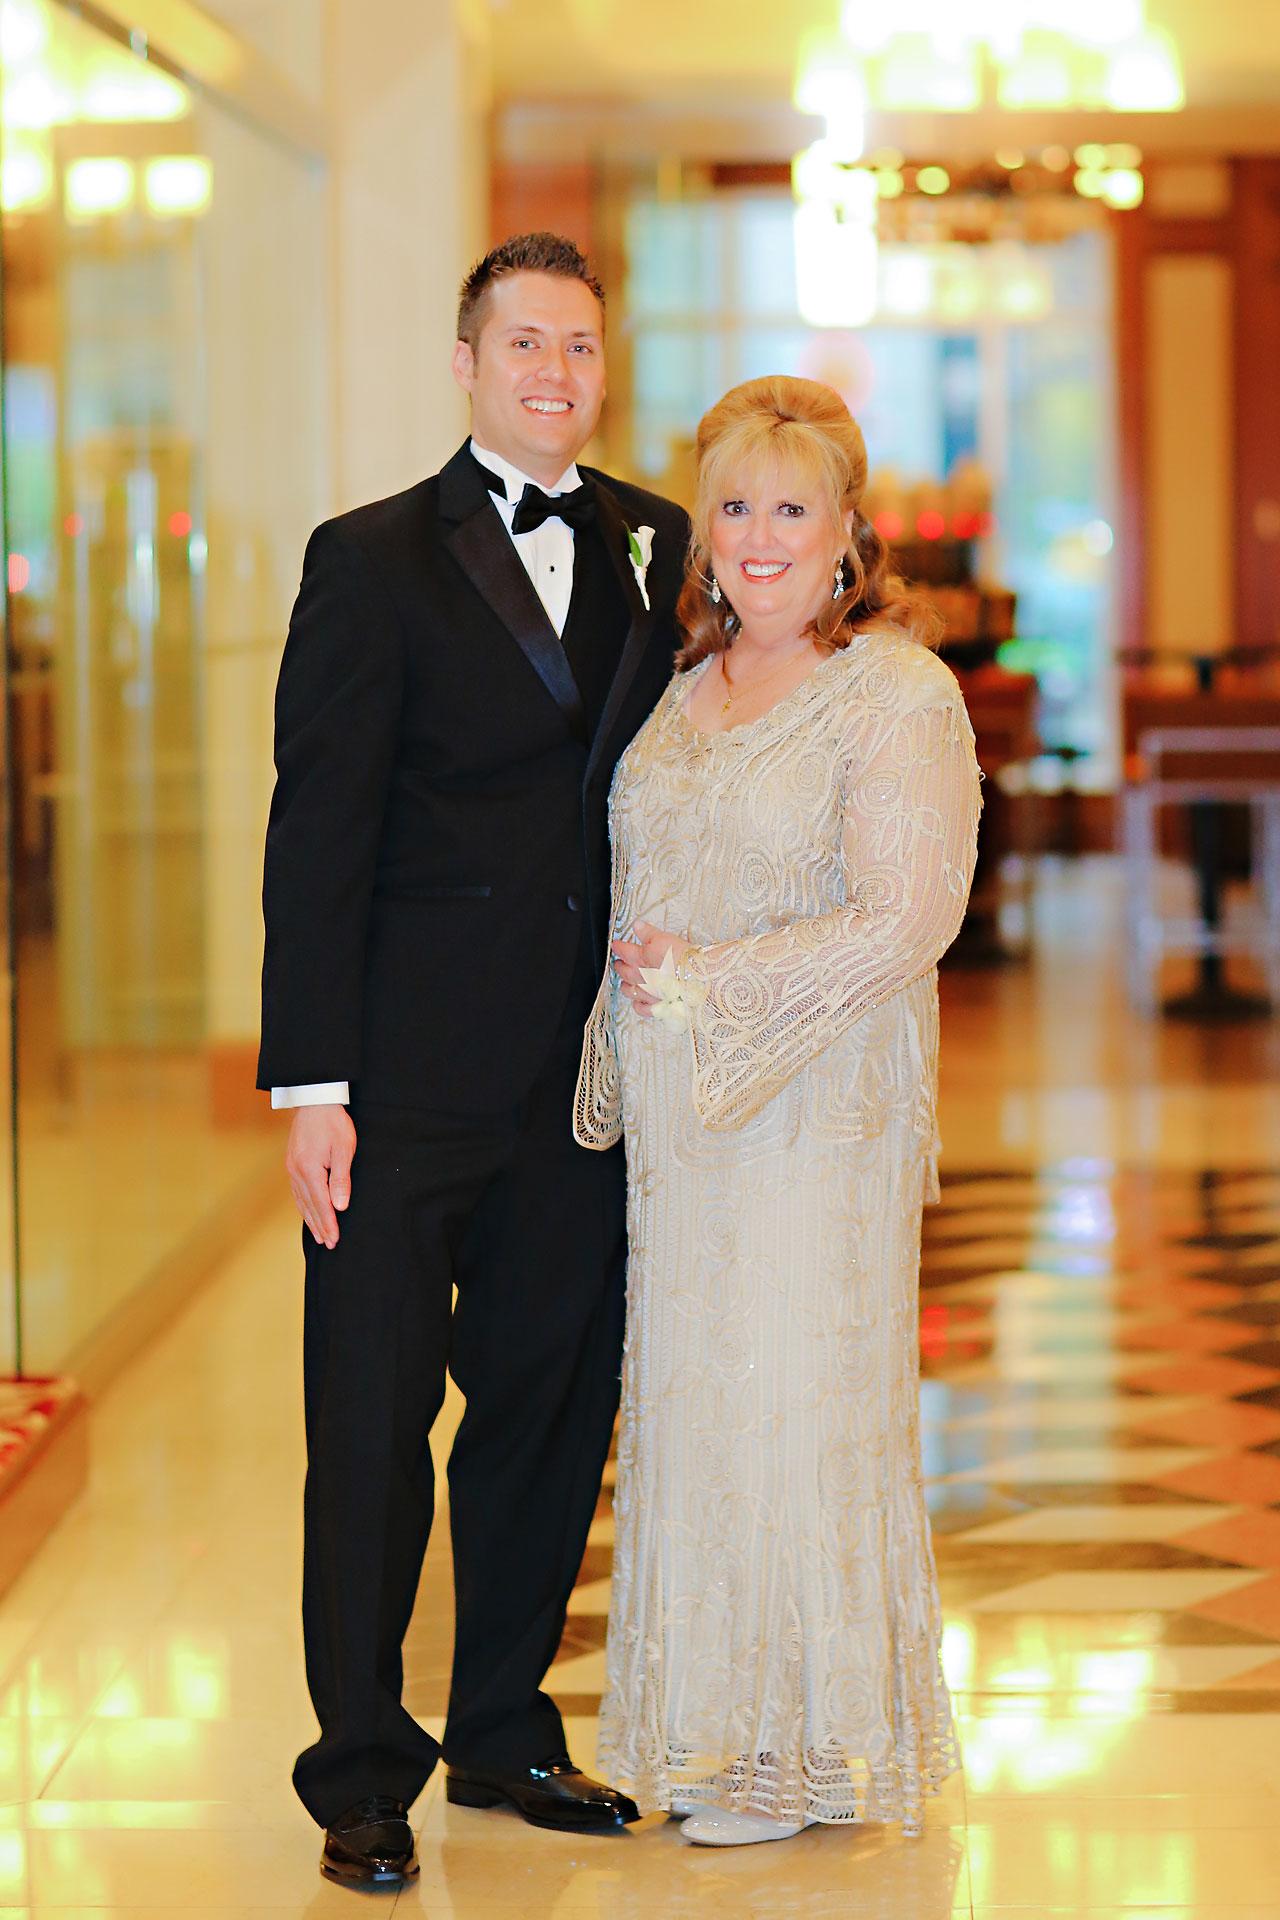 Kim Spencer Indiana Roof Ballroom Wedding 060